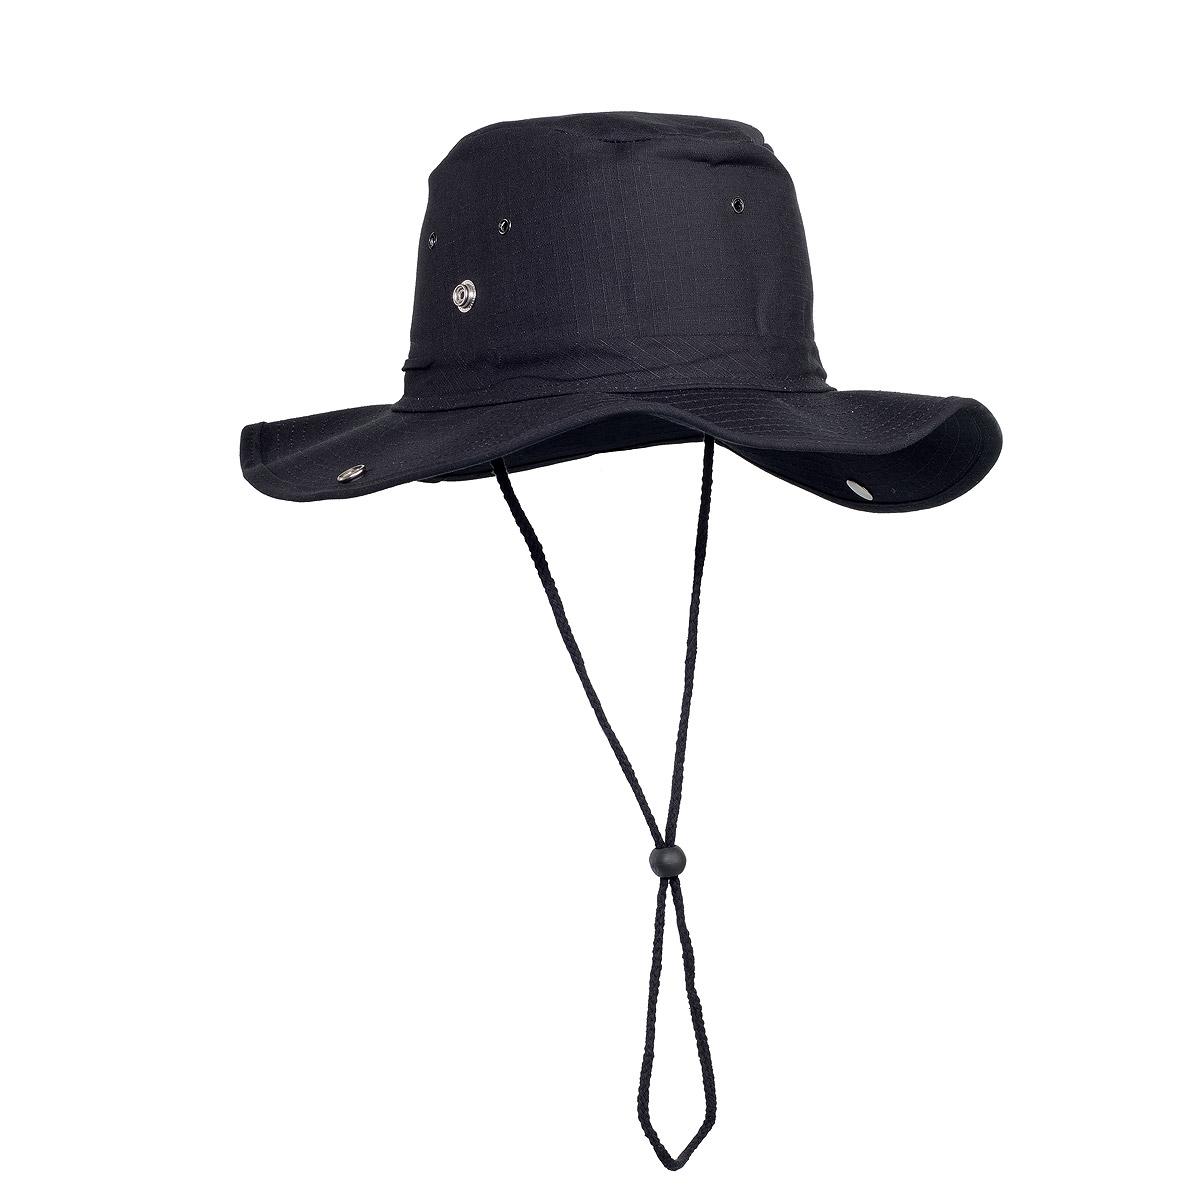 Kopfbedeckung wie den US Buschhut bei bw-discount.de